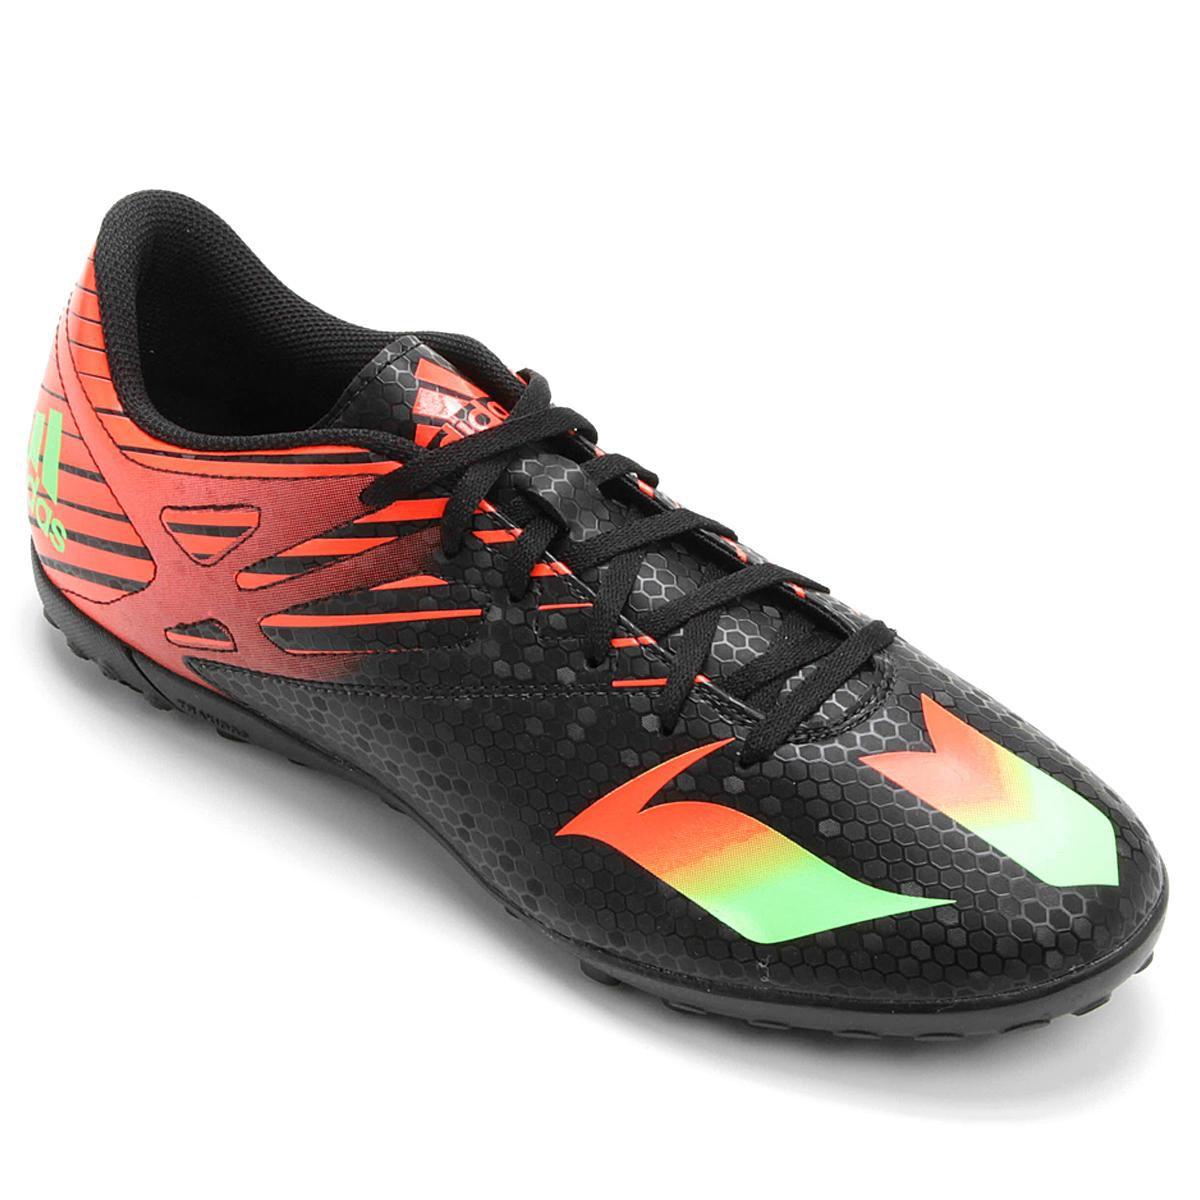 Chuteira Society Adidas Messi 15.4 t